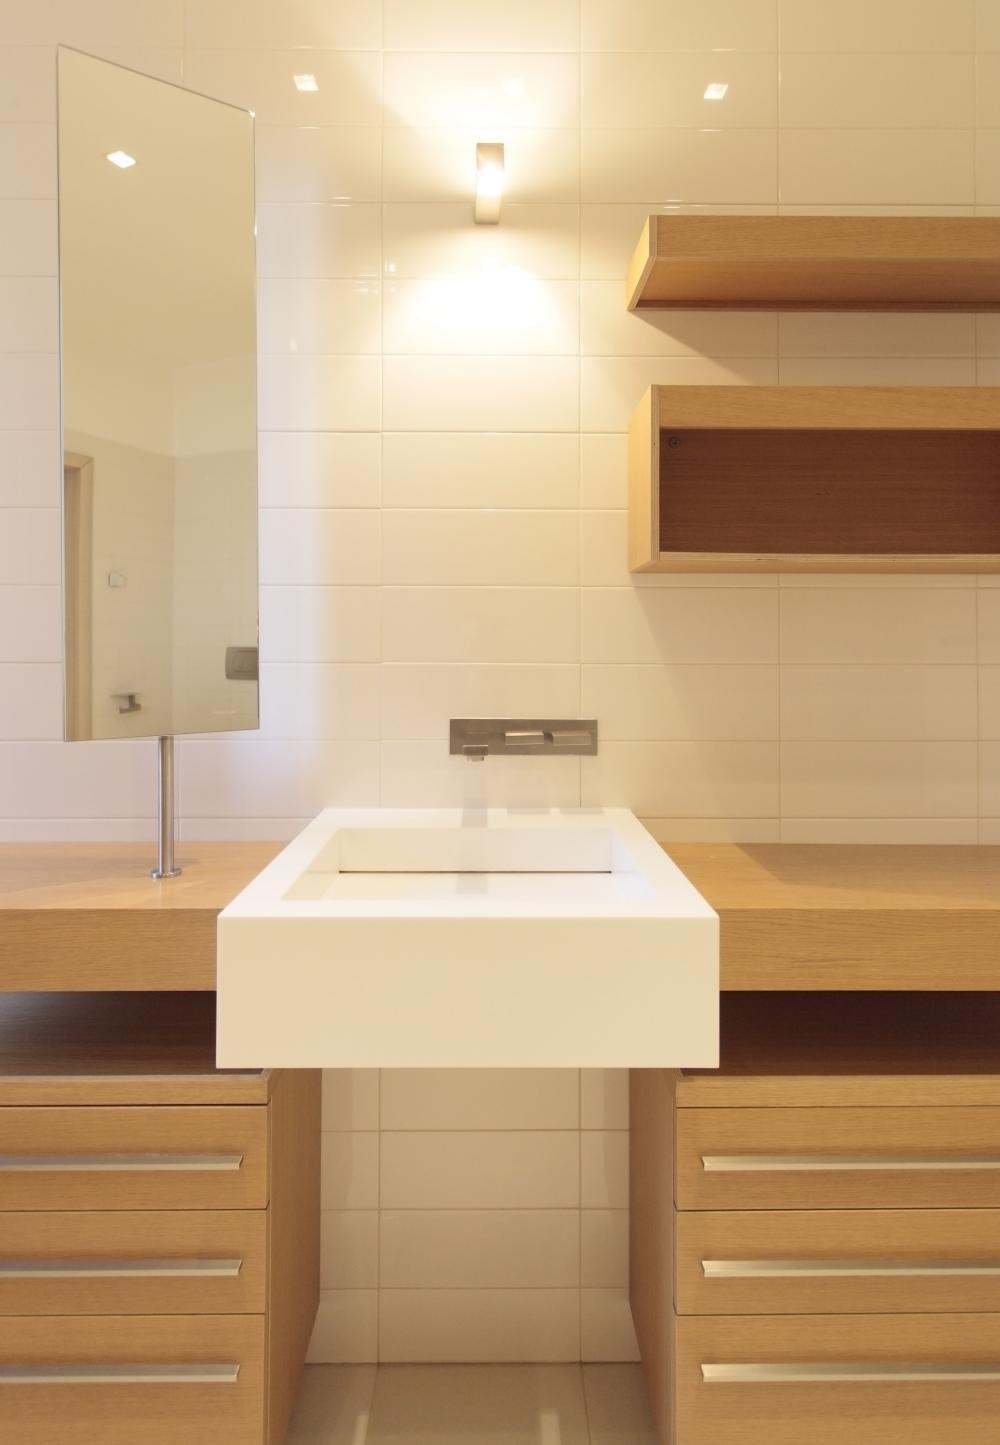 https://nbc-arhitect.ro/wp-content/uploads/2020/10/NBC-Arhitect-_-Cube-House-_-Bucharest-Romania-_-interior-view-bathroom_8.jpg